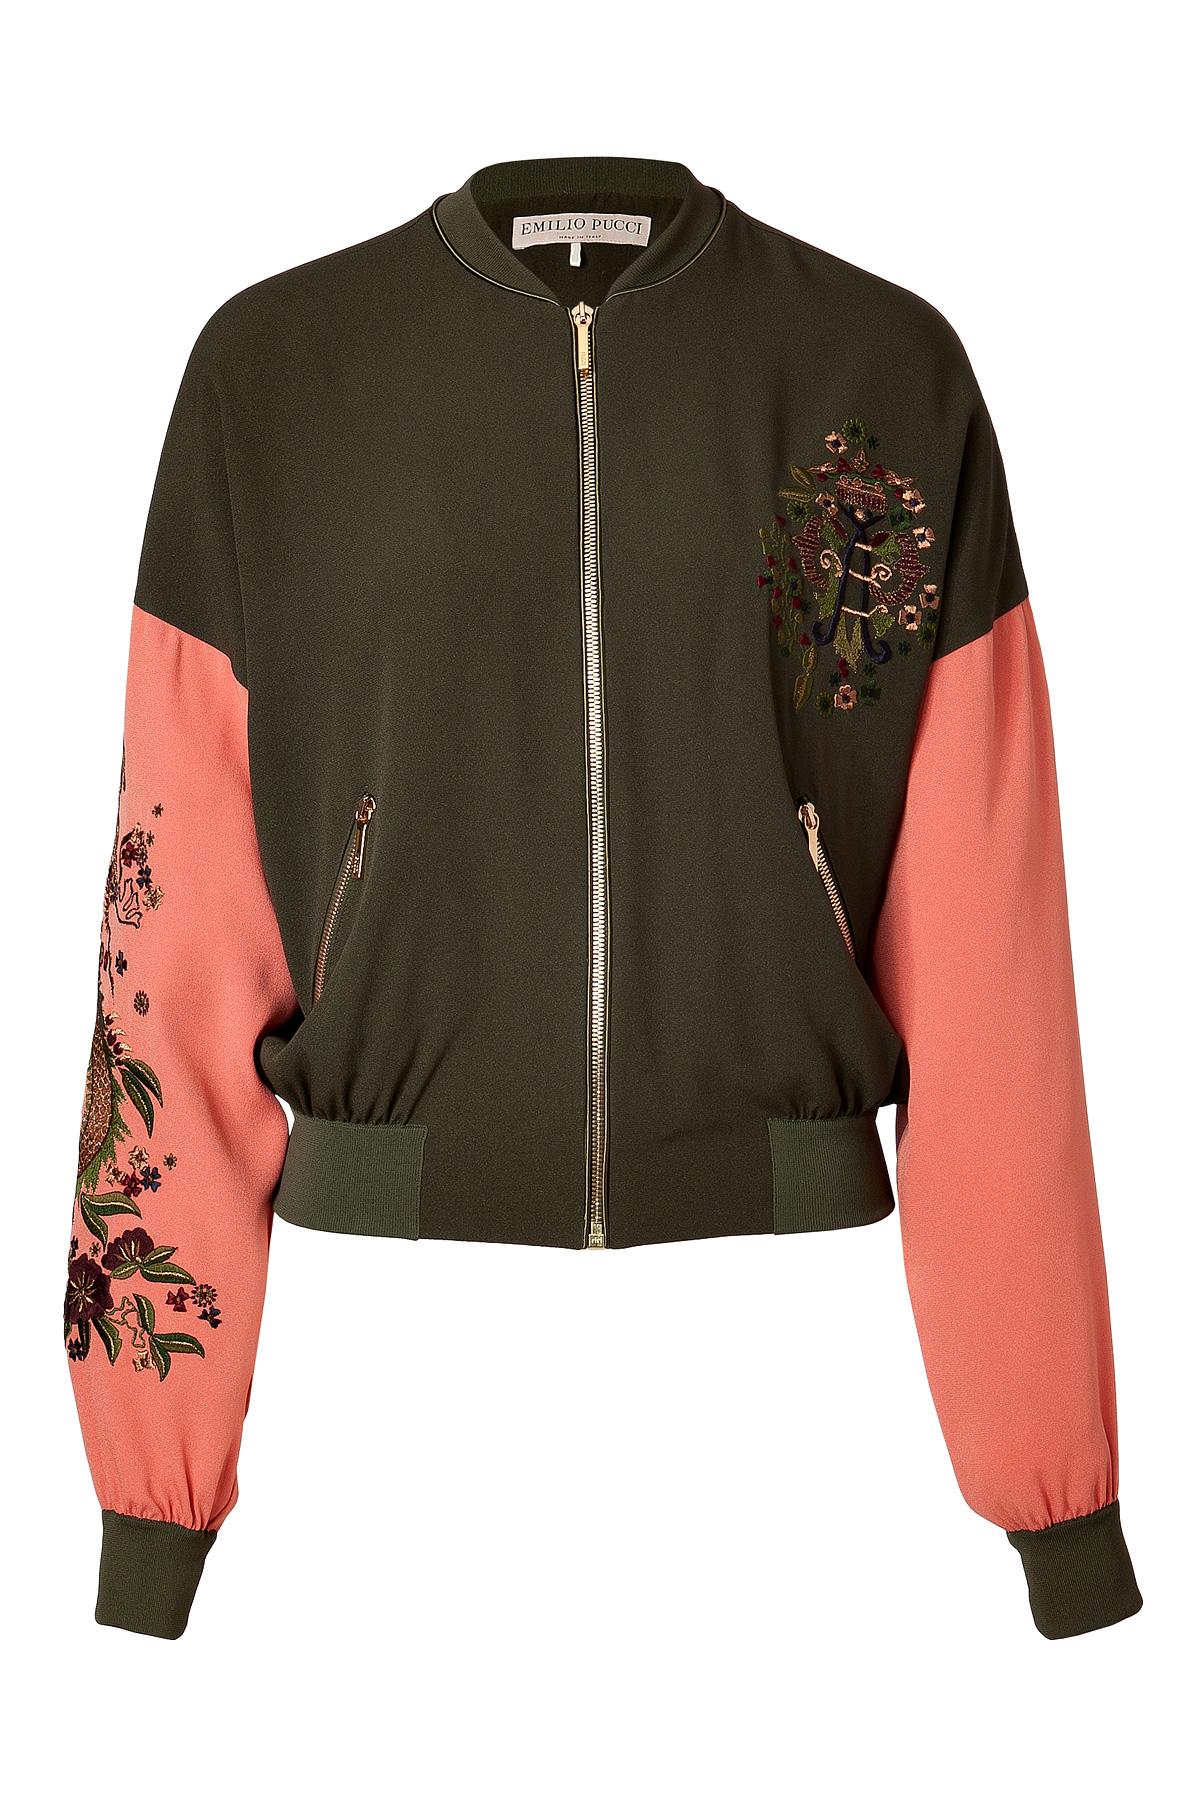 da6521d3a174 Lyst - Emilio Pucci Khakicoral Embroidered Silk Bomber Jacket